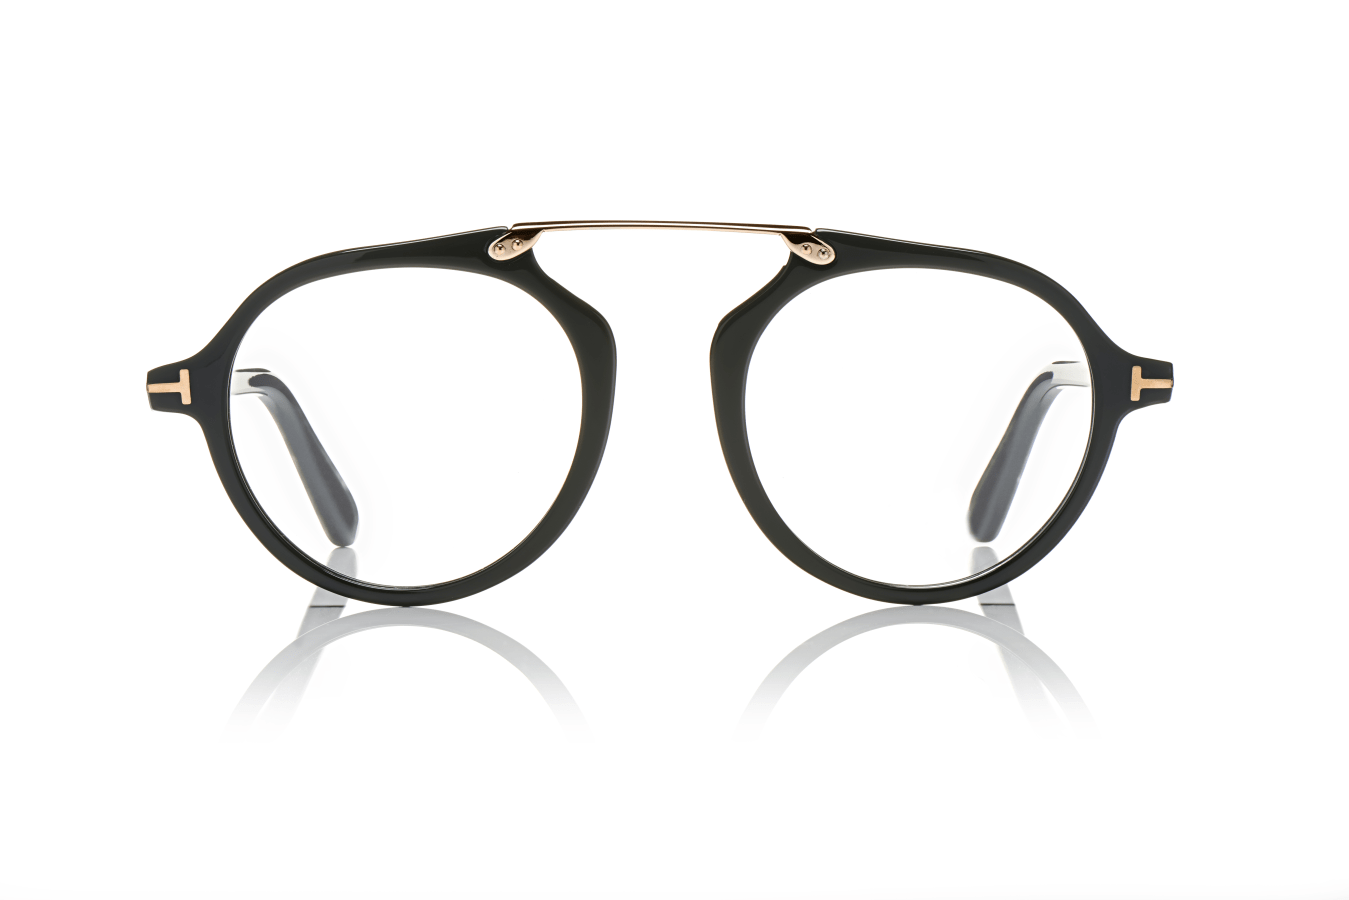 Black Tom Ford Sunglasses